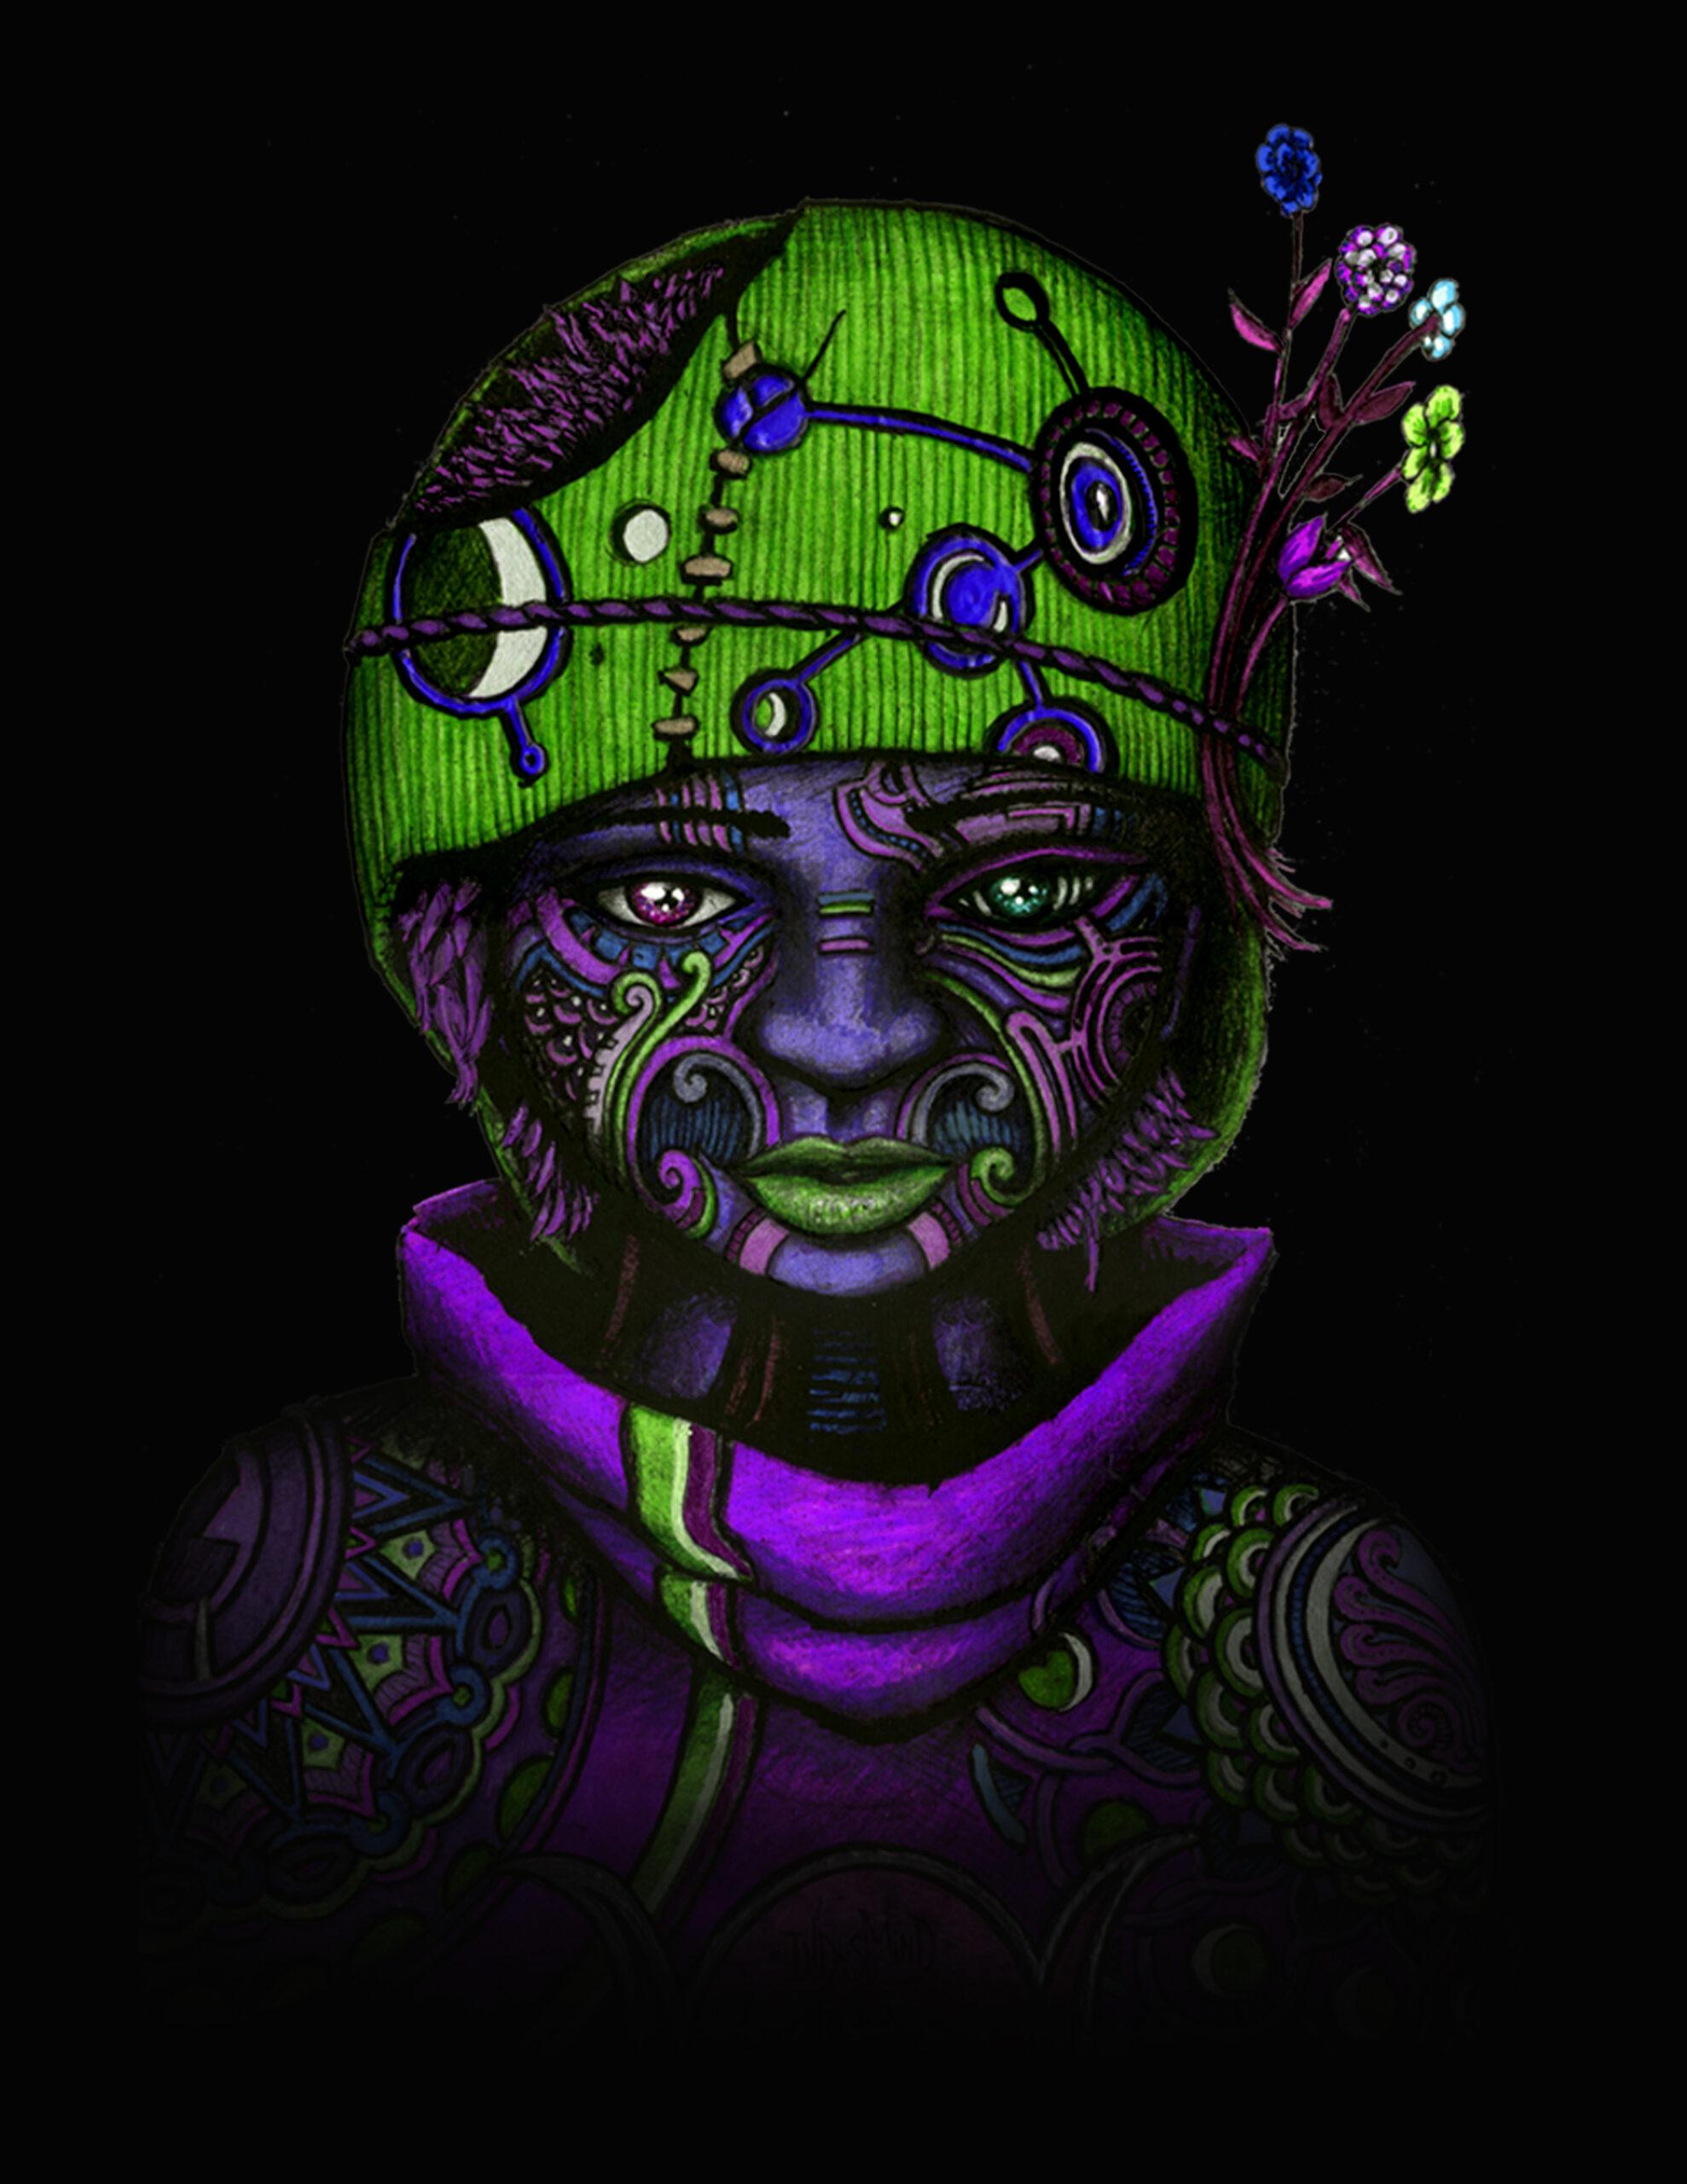 The awakening (2/9) by INDUSMiND